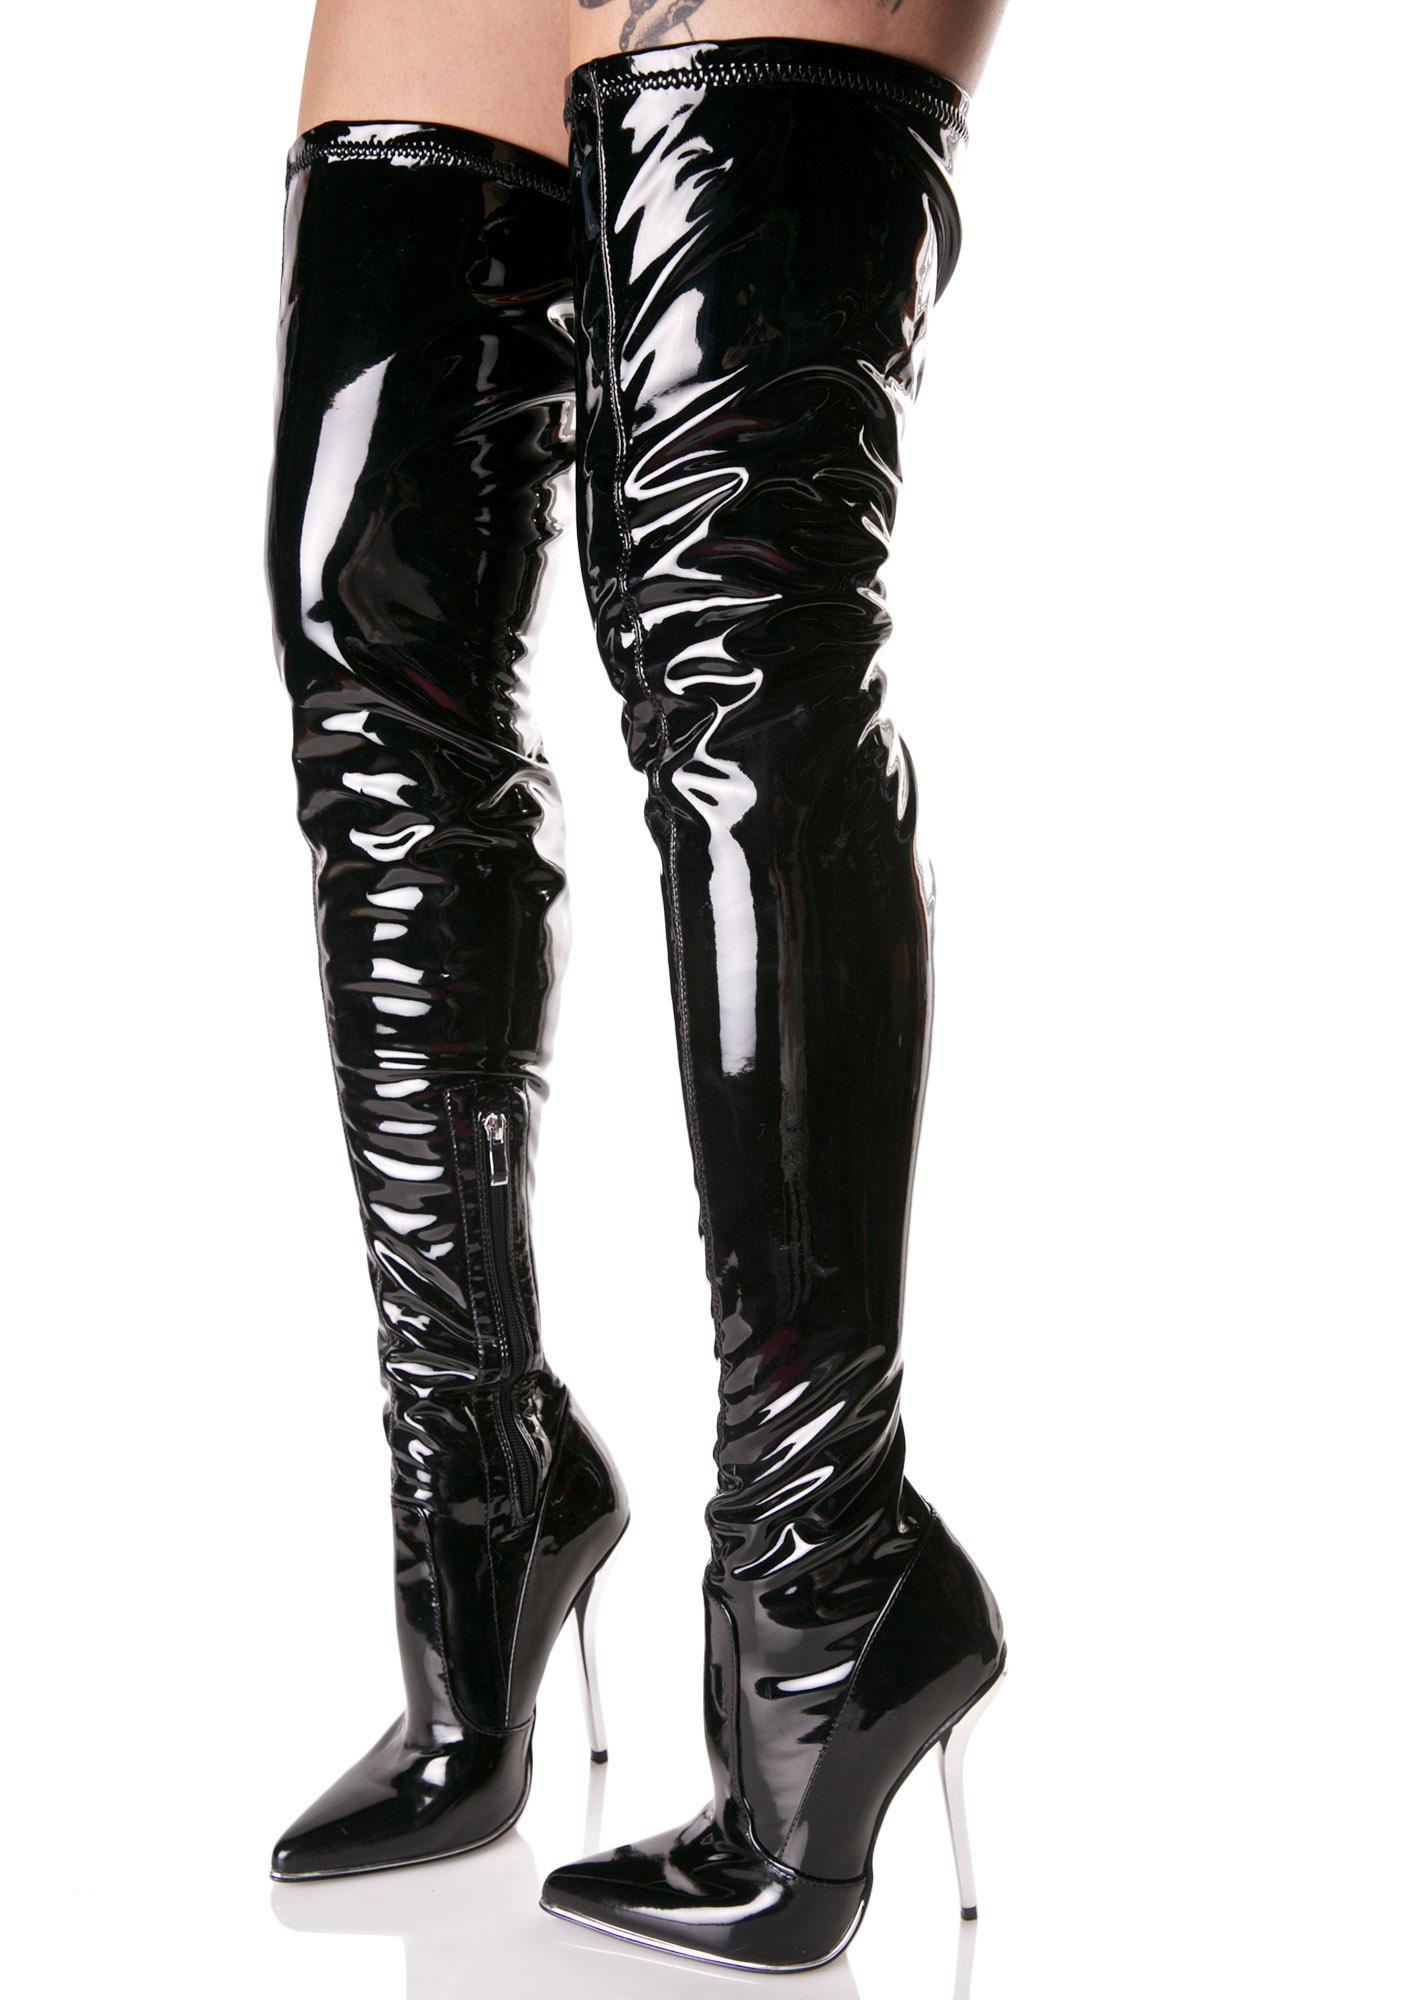 Manic Thigh-High Boots